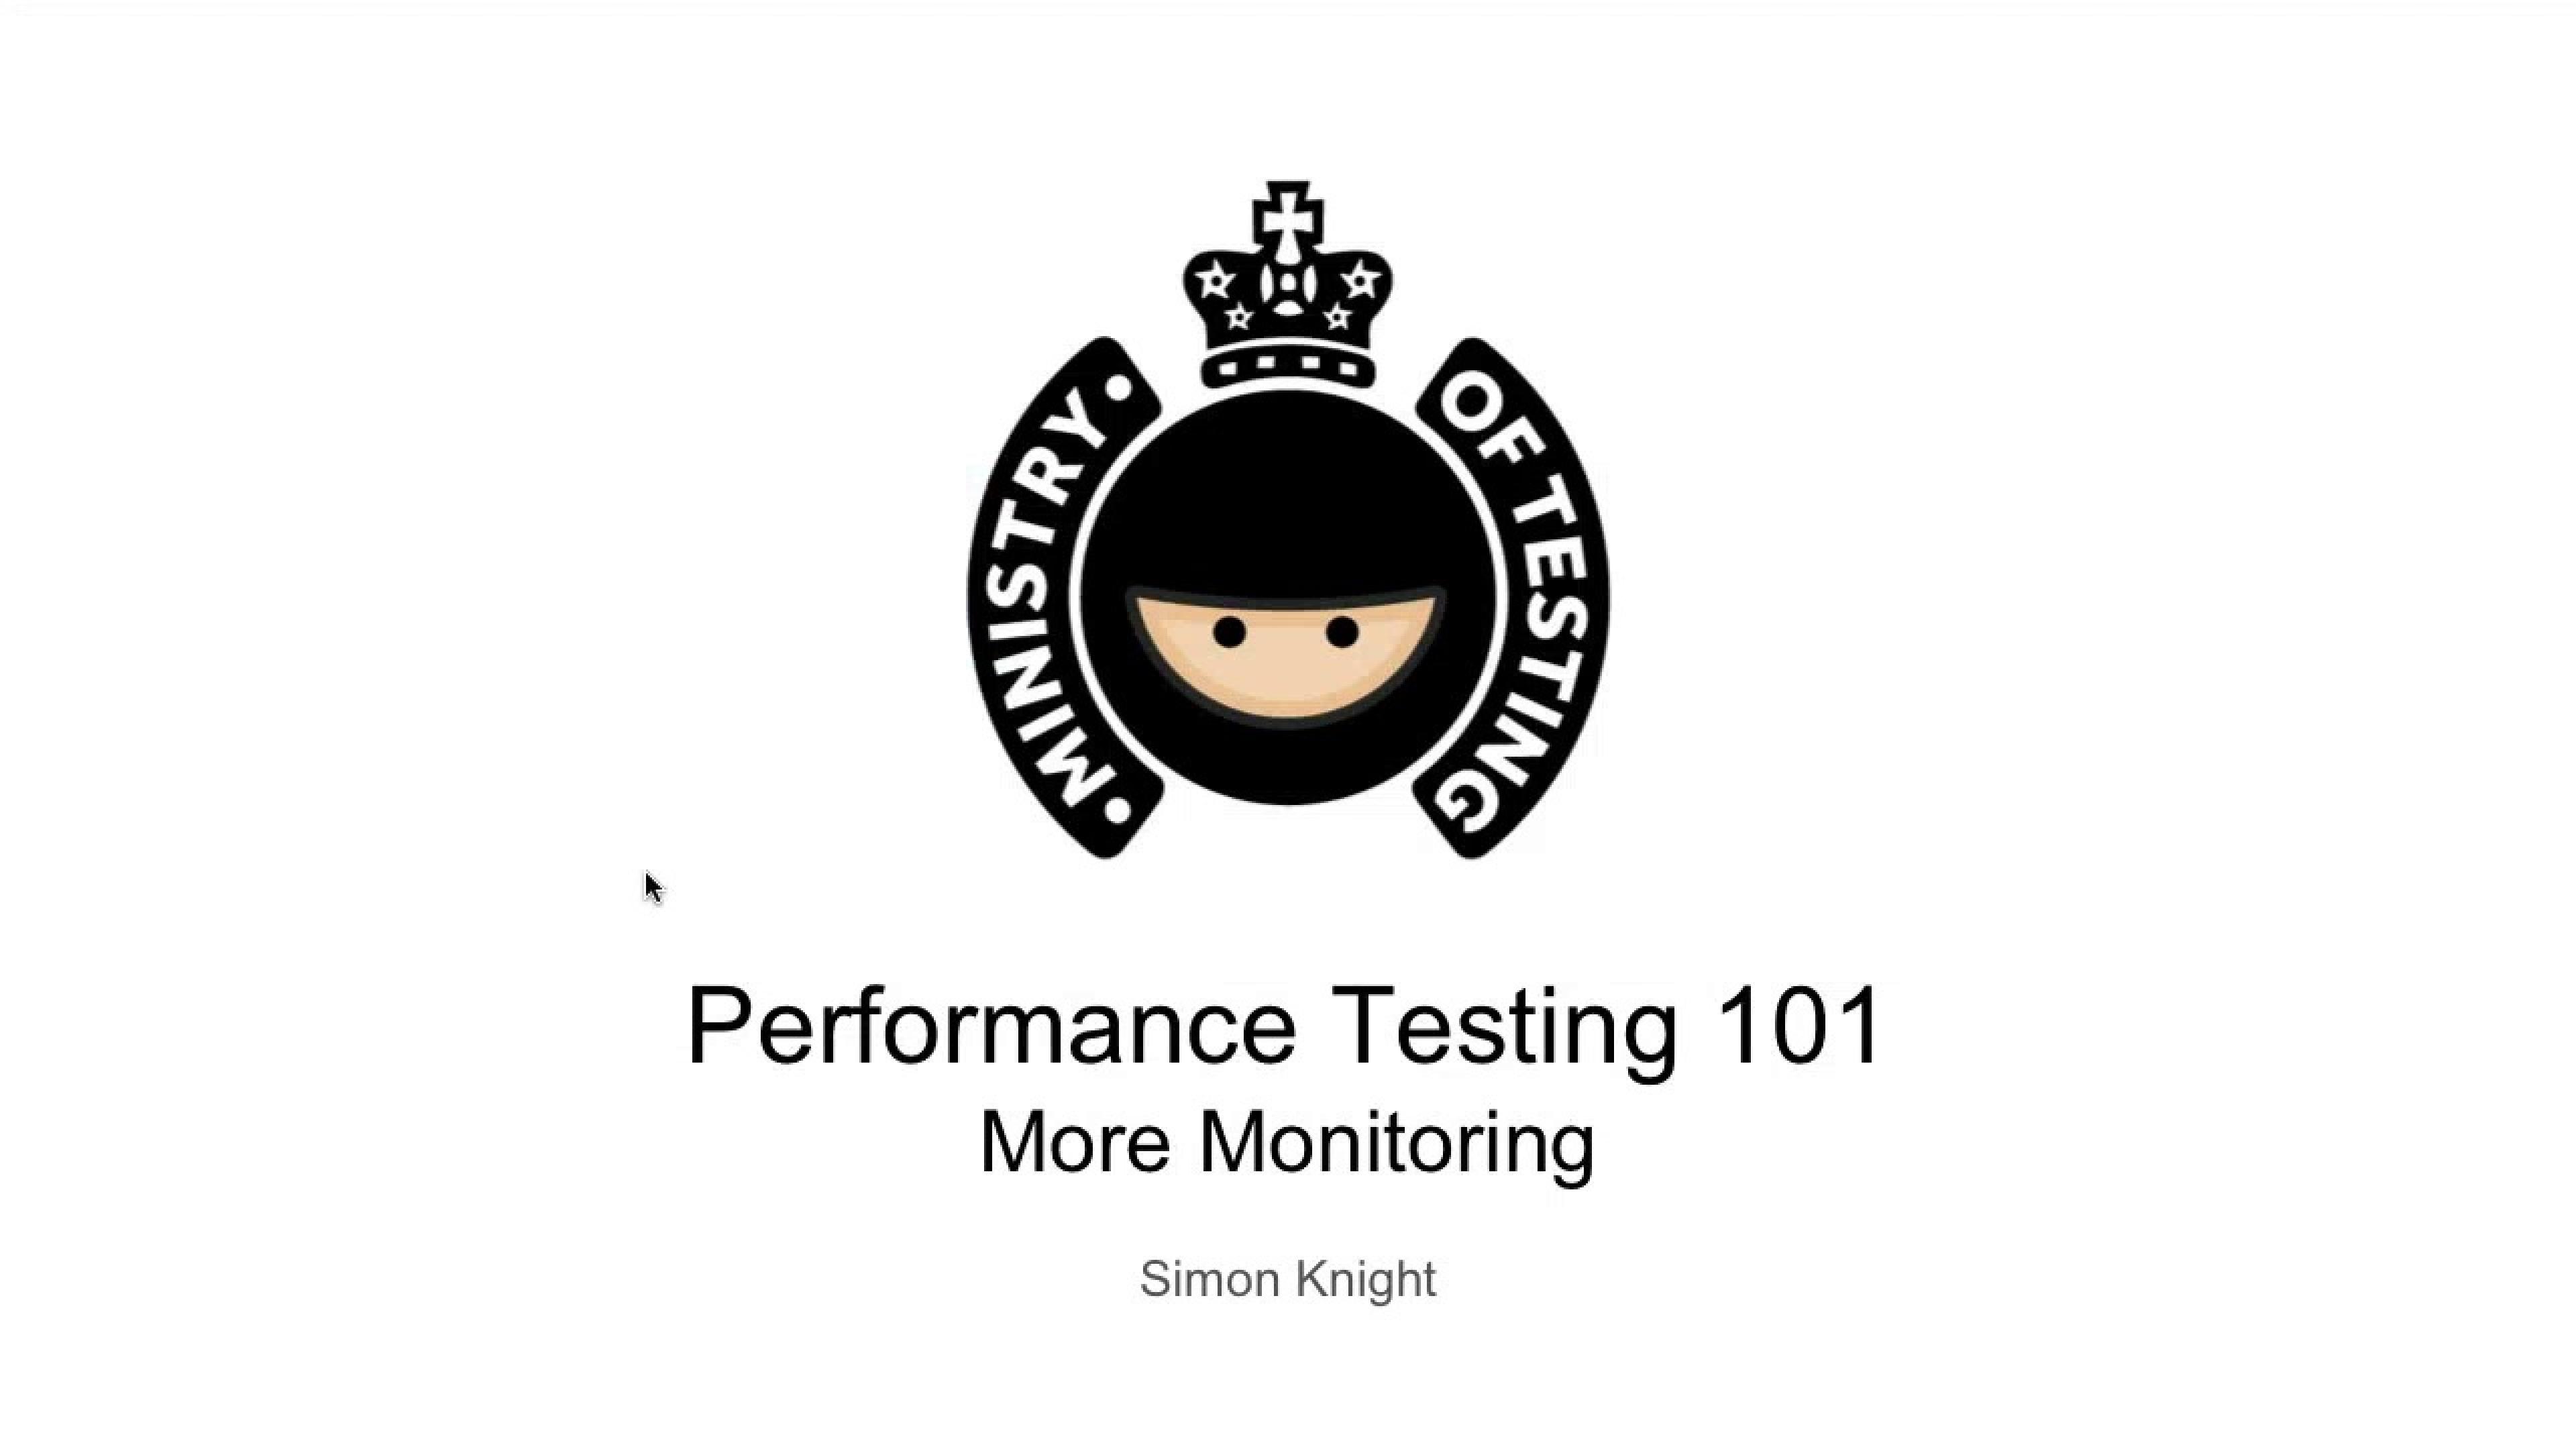 More Monitoring